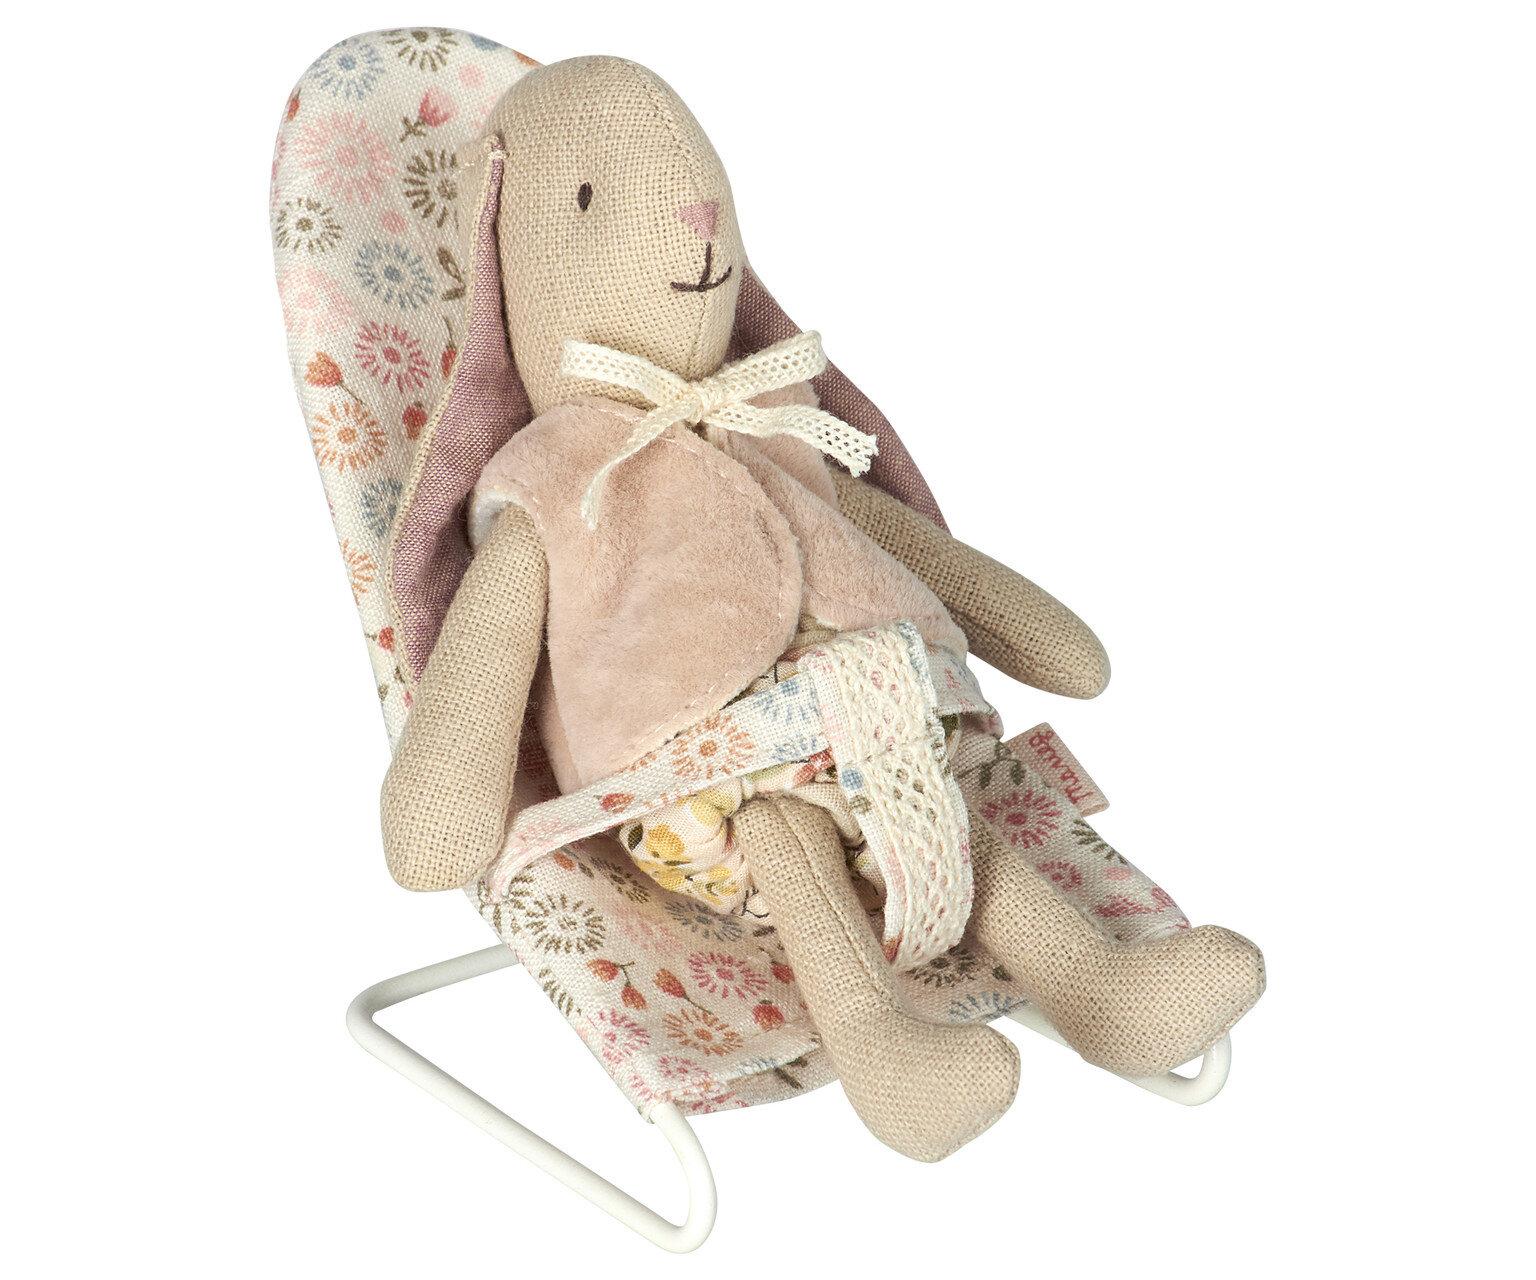 Baby Bouncer £8.00